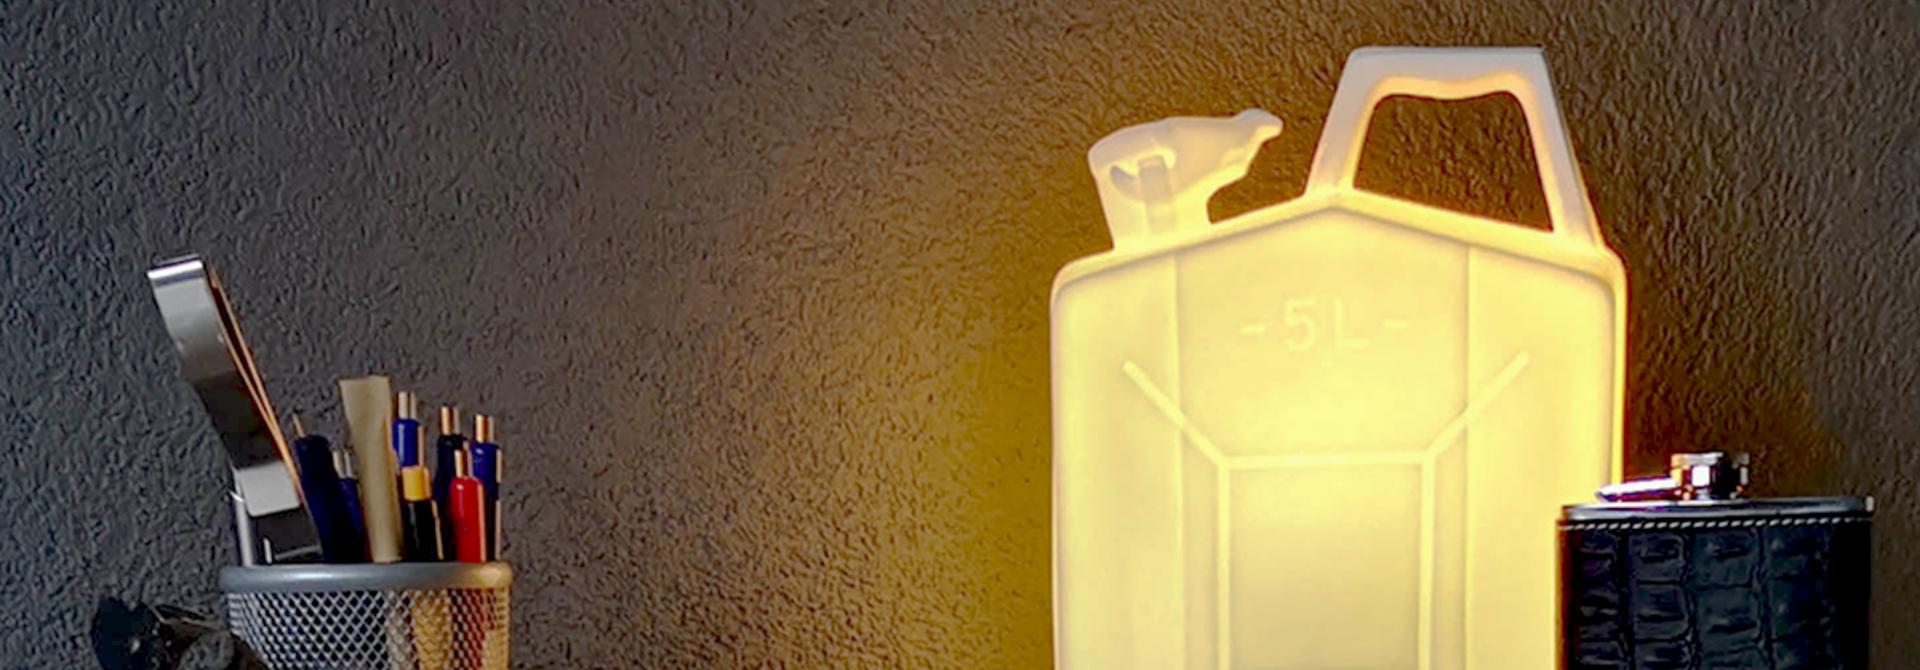 Porcelain jerrycan lamp